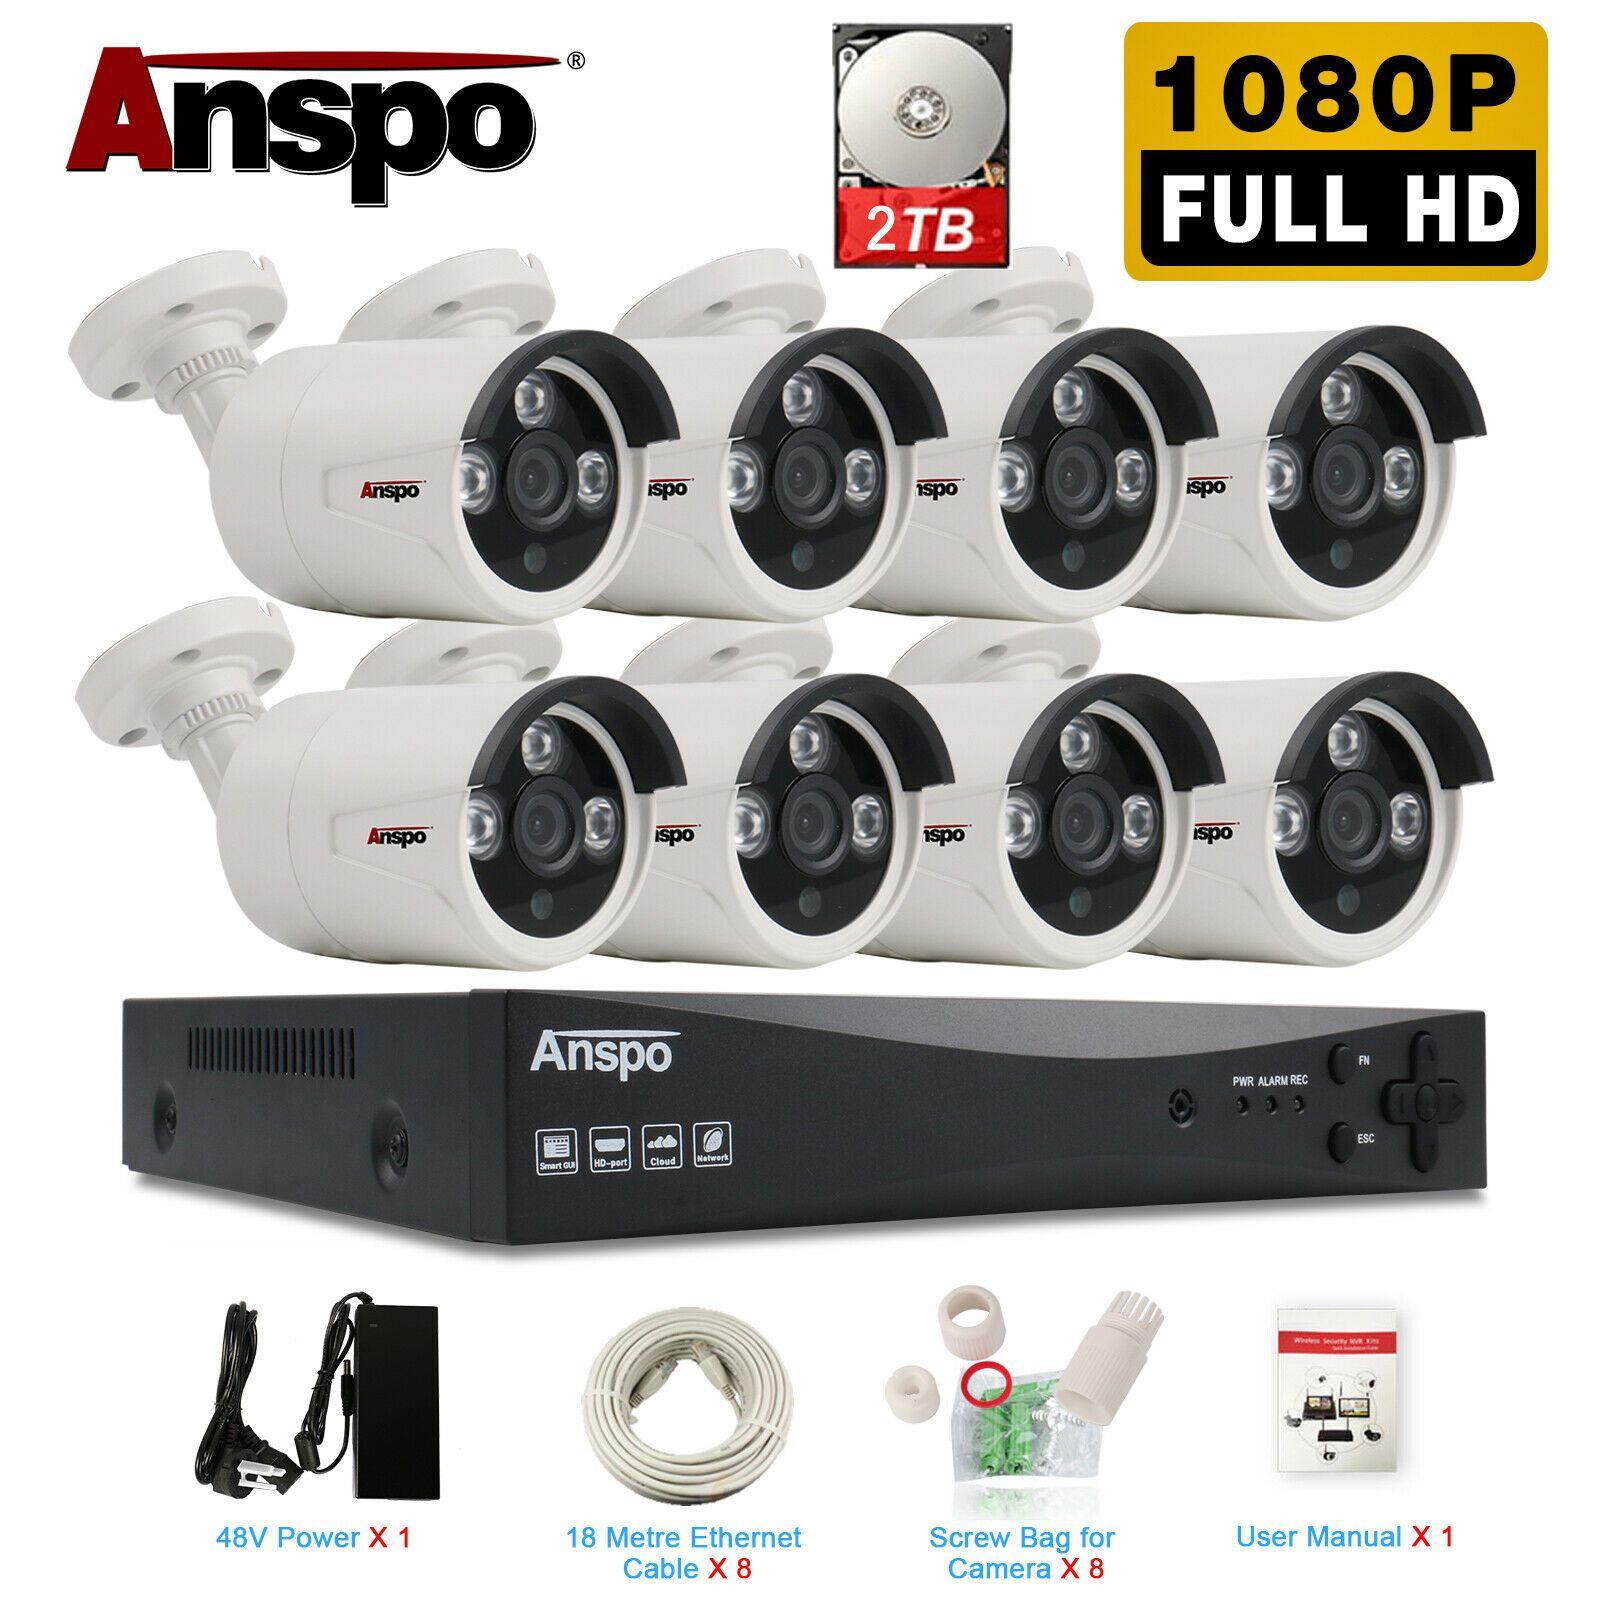 Anspo H.265 8CH 5.0MP HDMI PoE NVR كيت نظام الأمن CCTV 2.0MP IR في الهواء الطلق سجل الصوت IP كاميرا P2P مراقبة الفيديو مجموعة